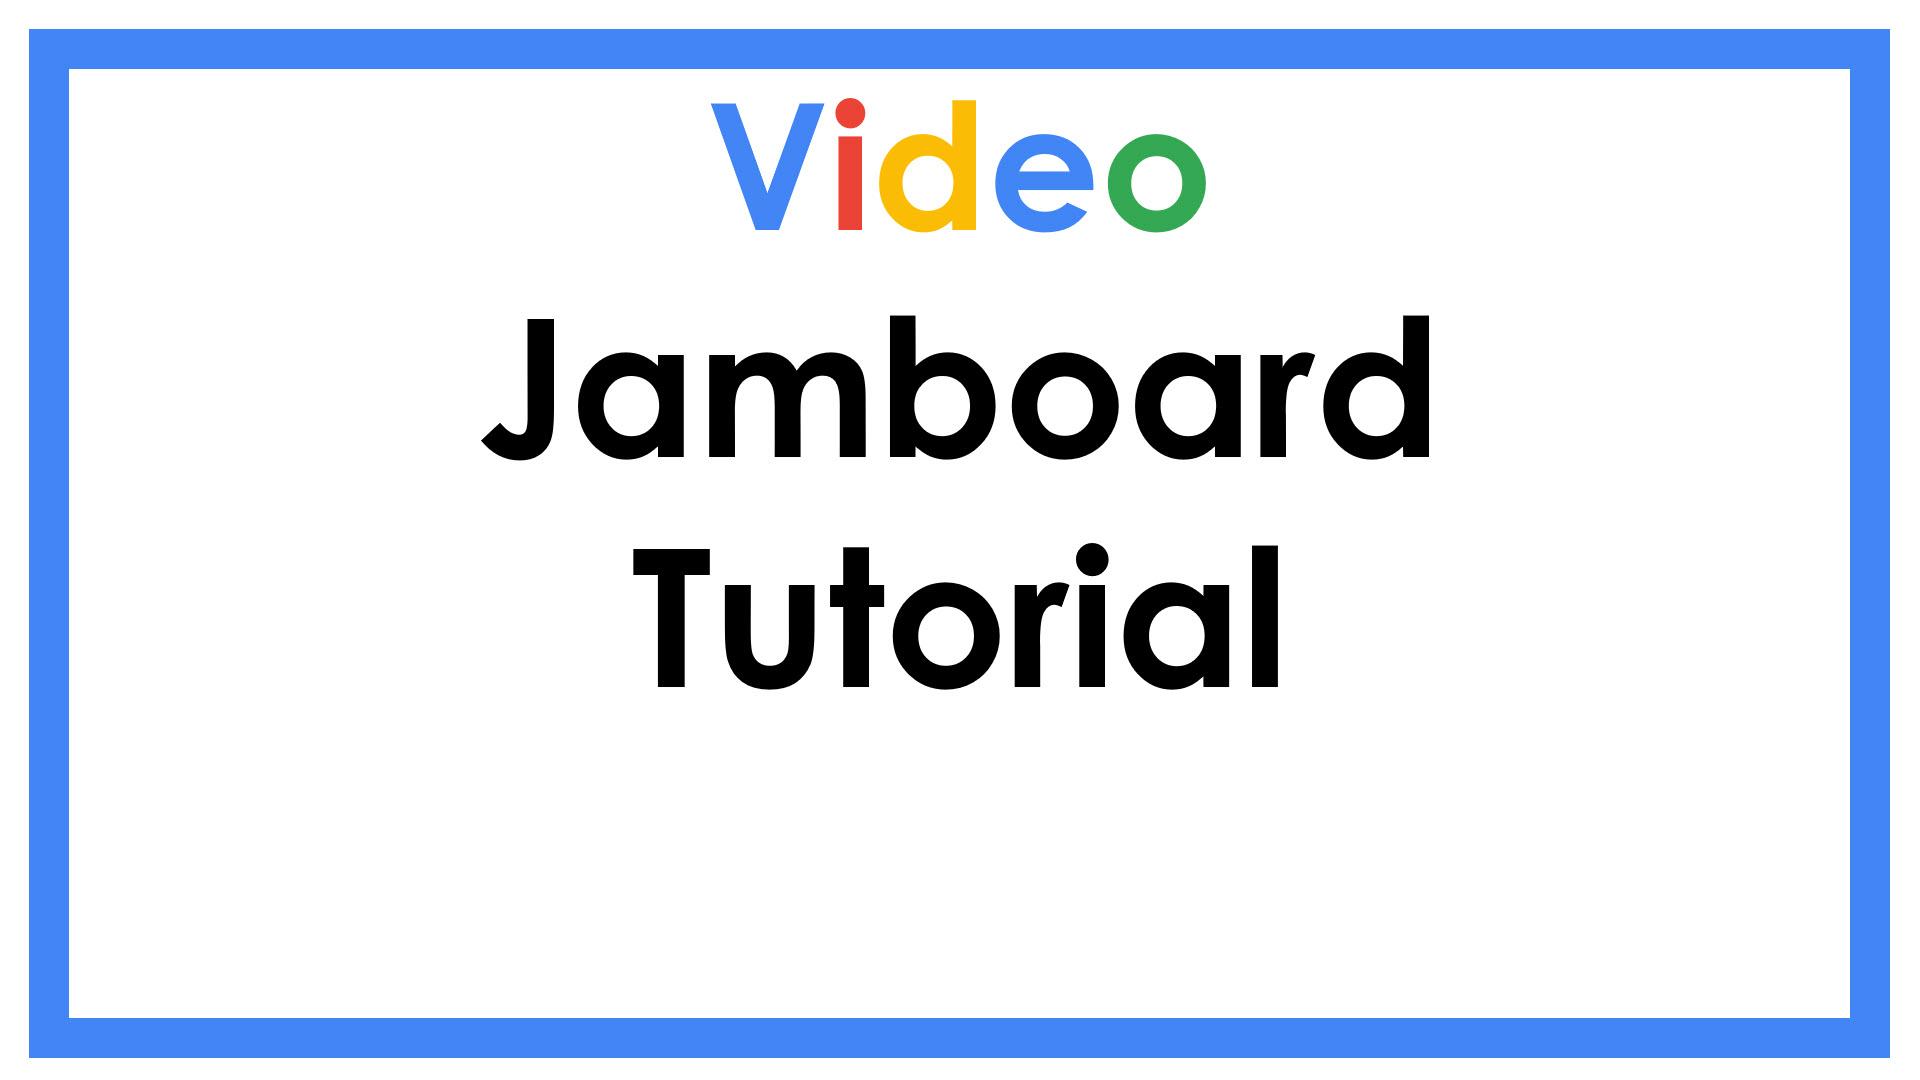 Jamboard Tutorial